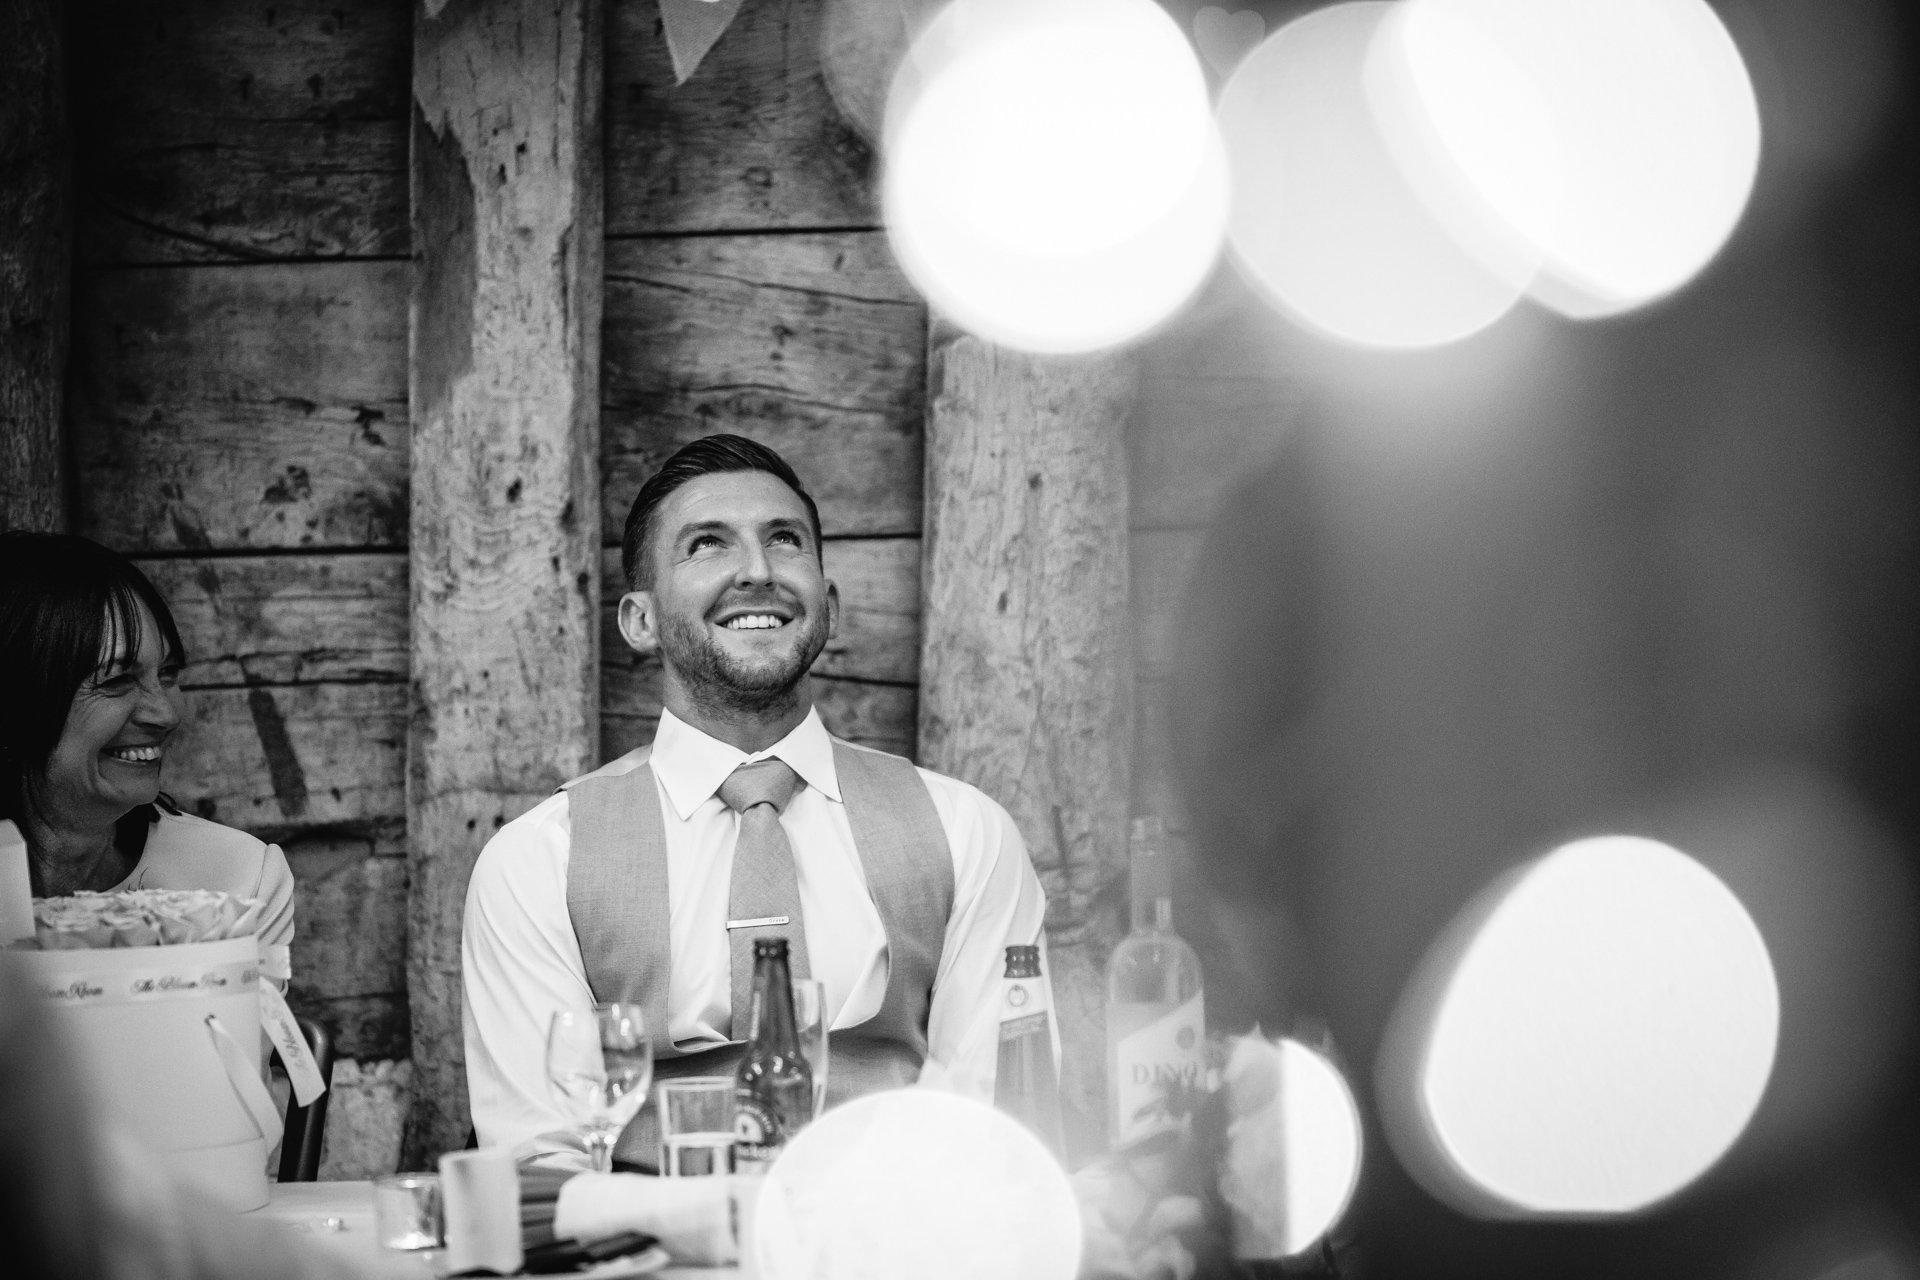 Groom looking embarrassed during wedding speeches